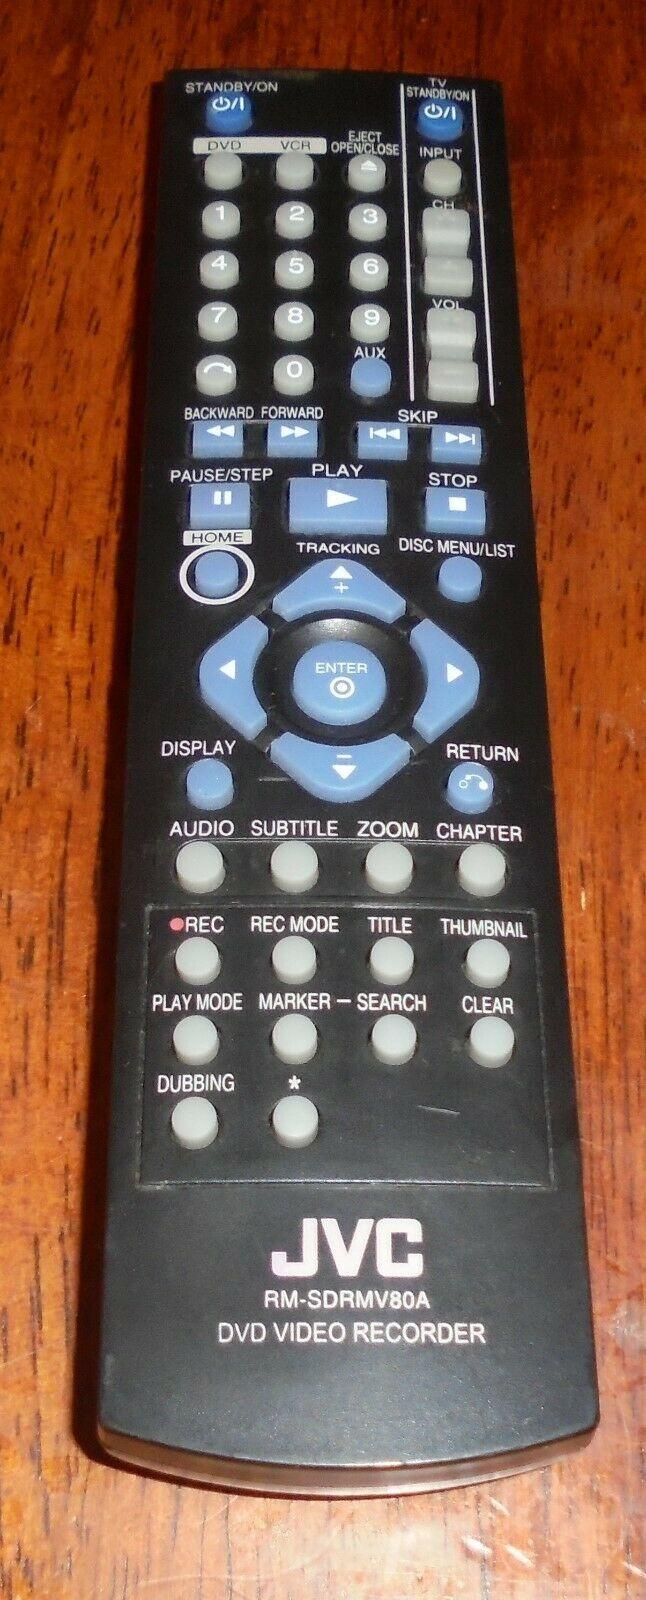 Genuine JVC RM-SDRMV80A Remote Control DRMV80B DR-MV80B Video Recorder Original